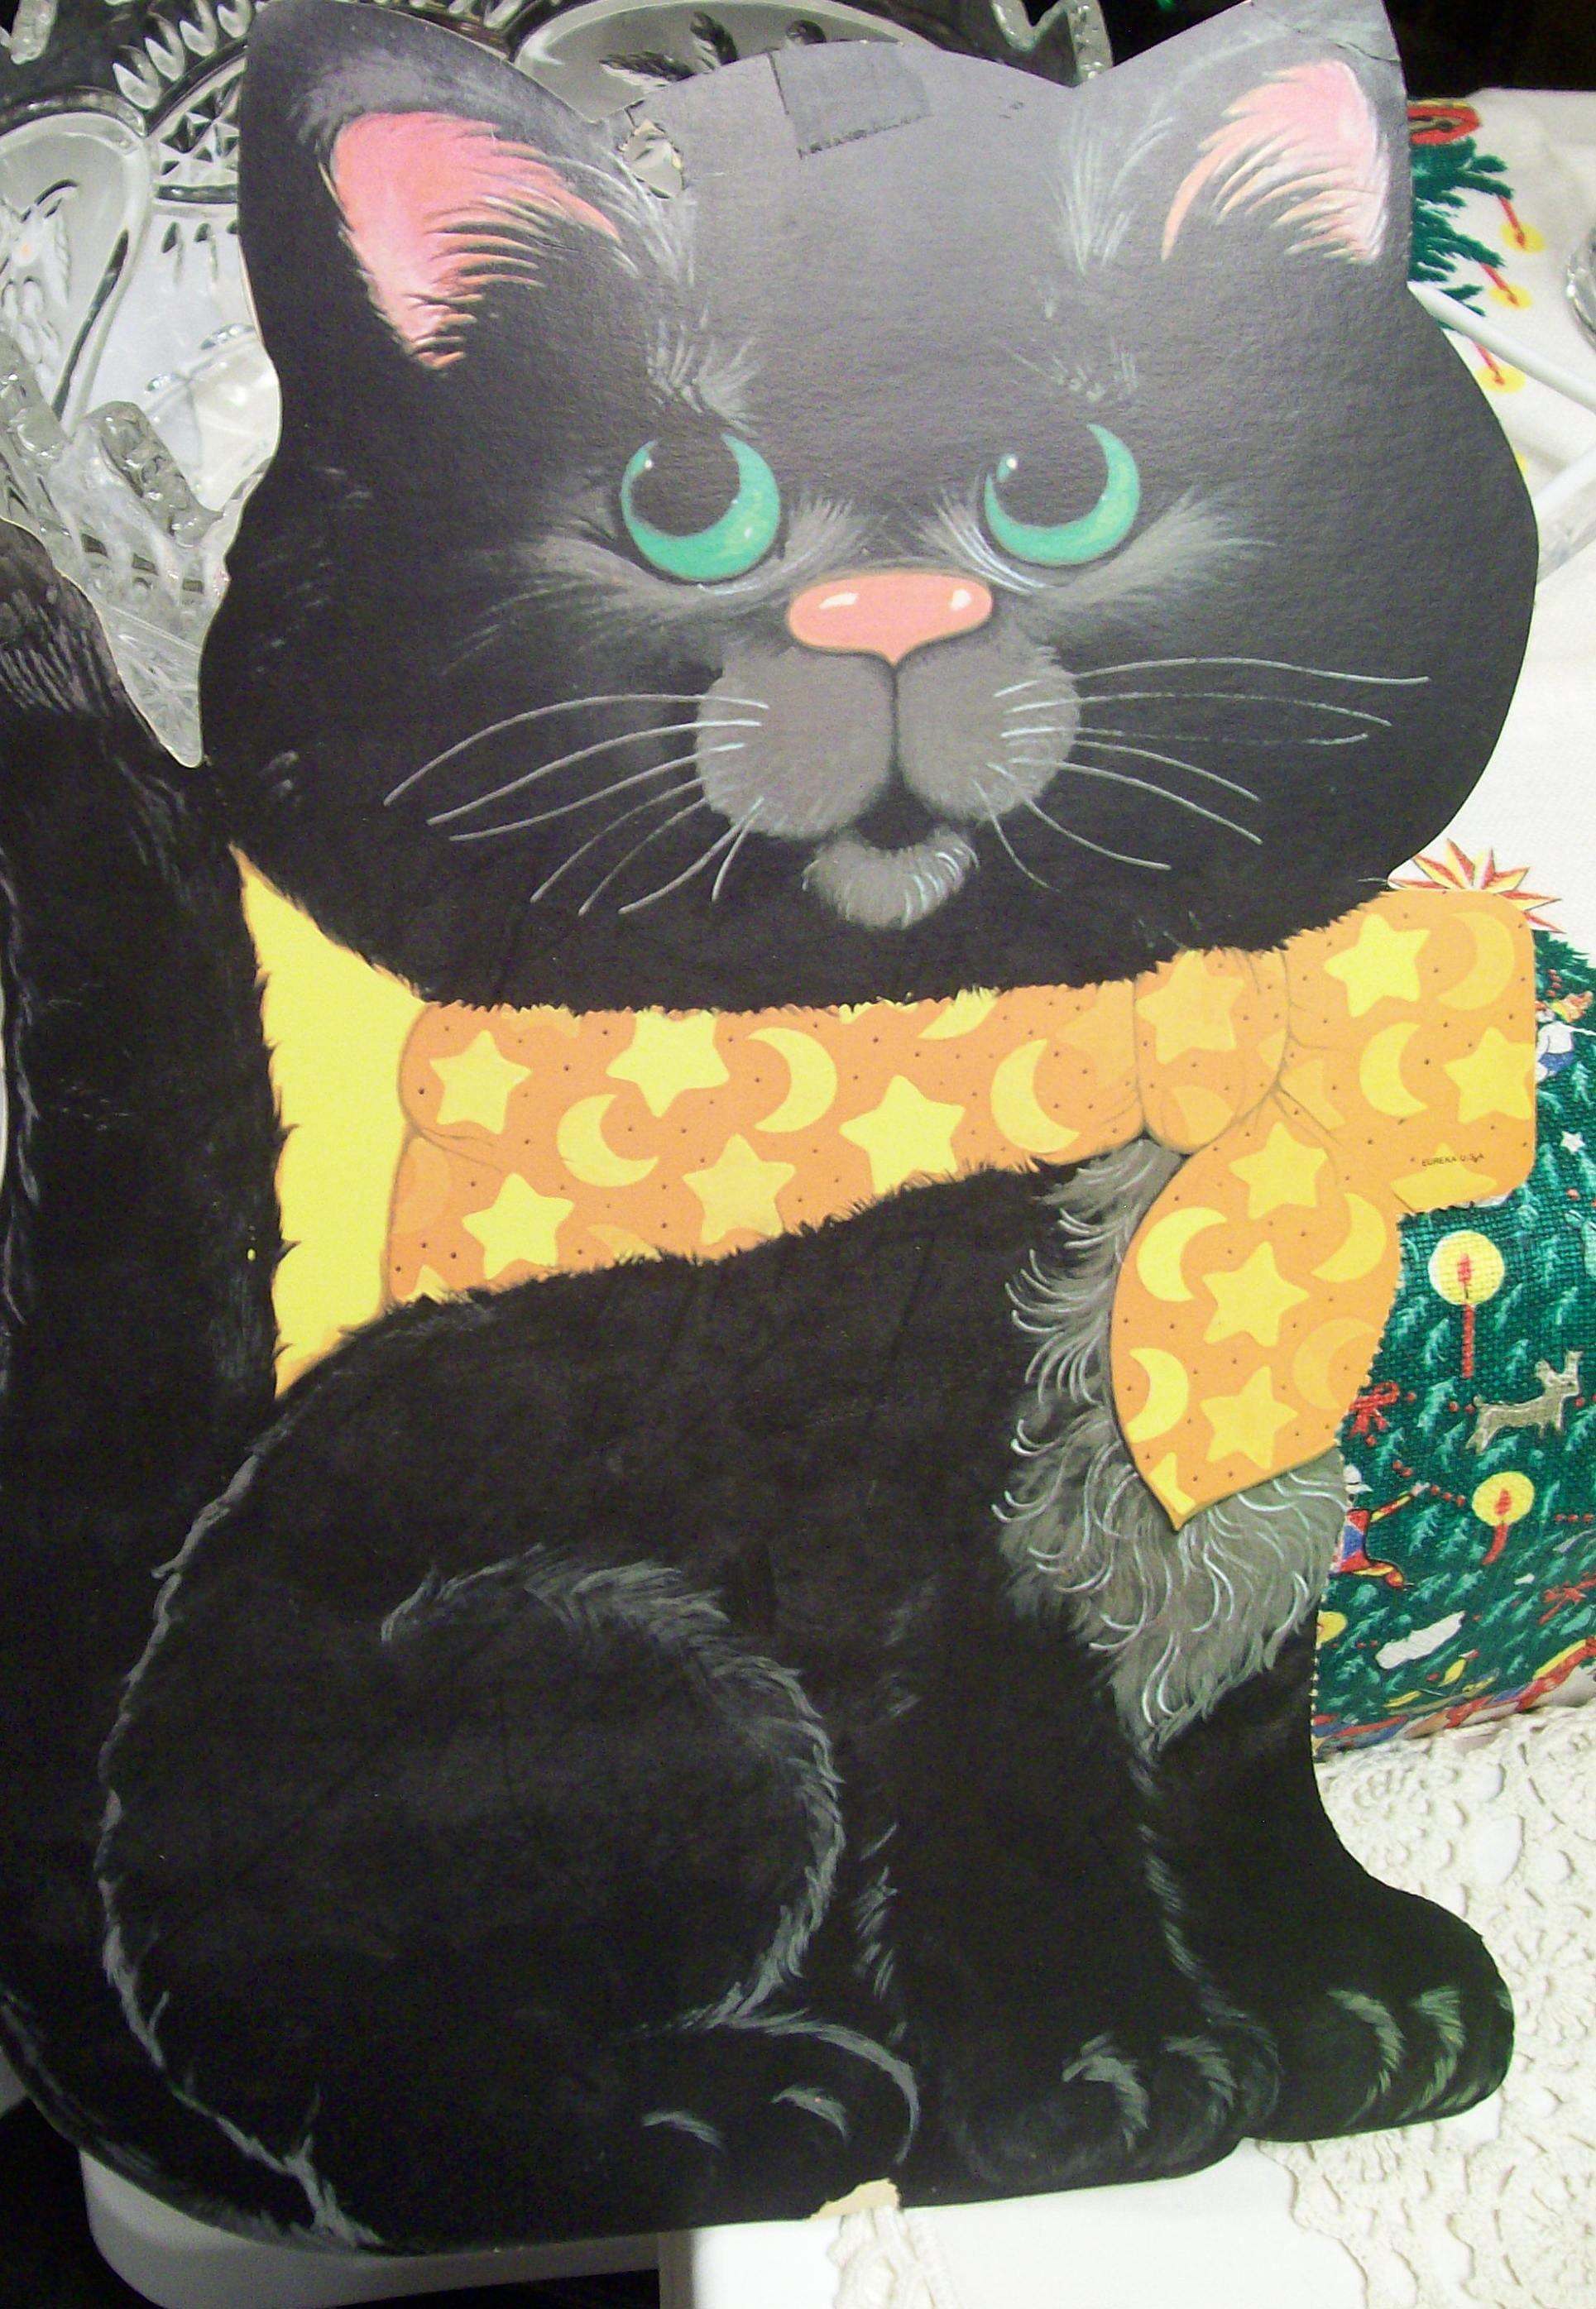 Vintage Black Cat, Kitty Cat, Halloween Cardboard Cut Out, Window or ...